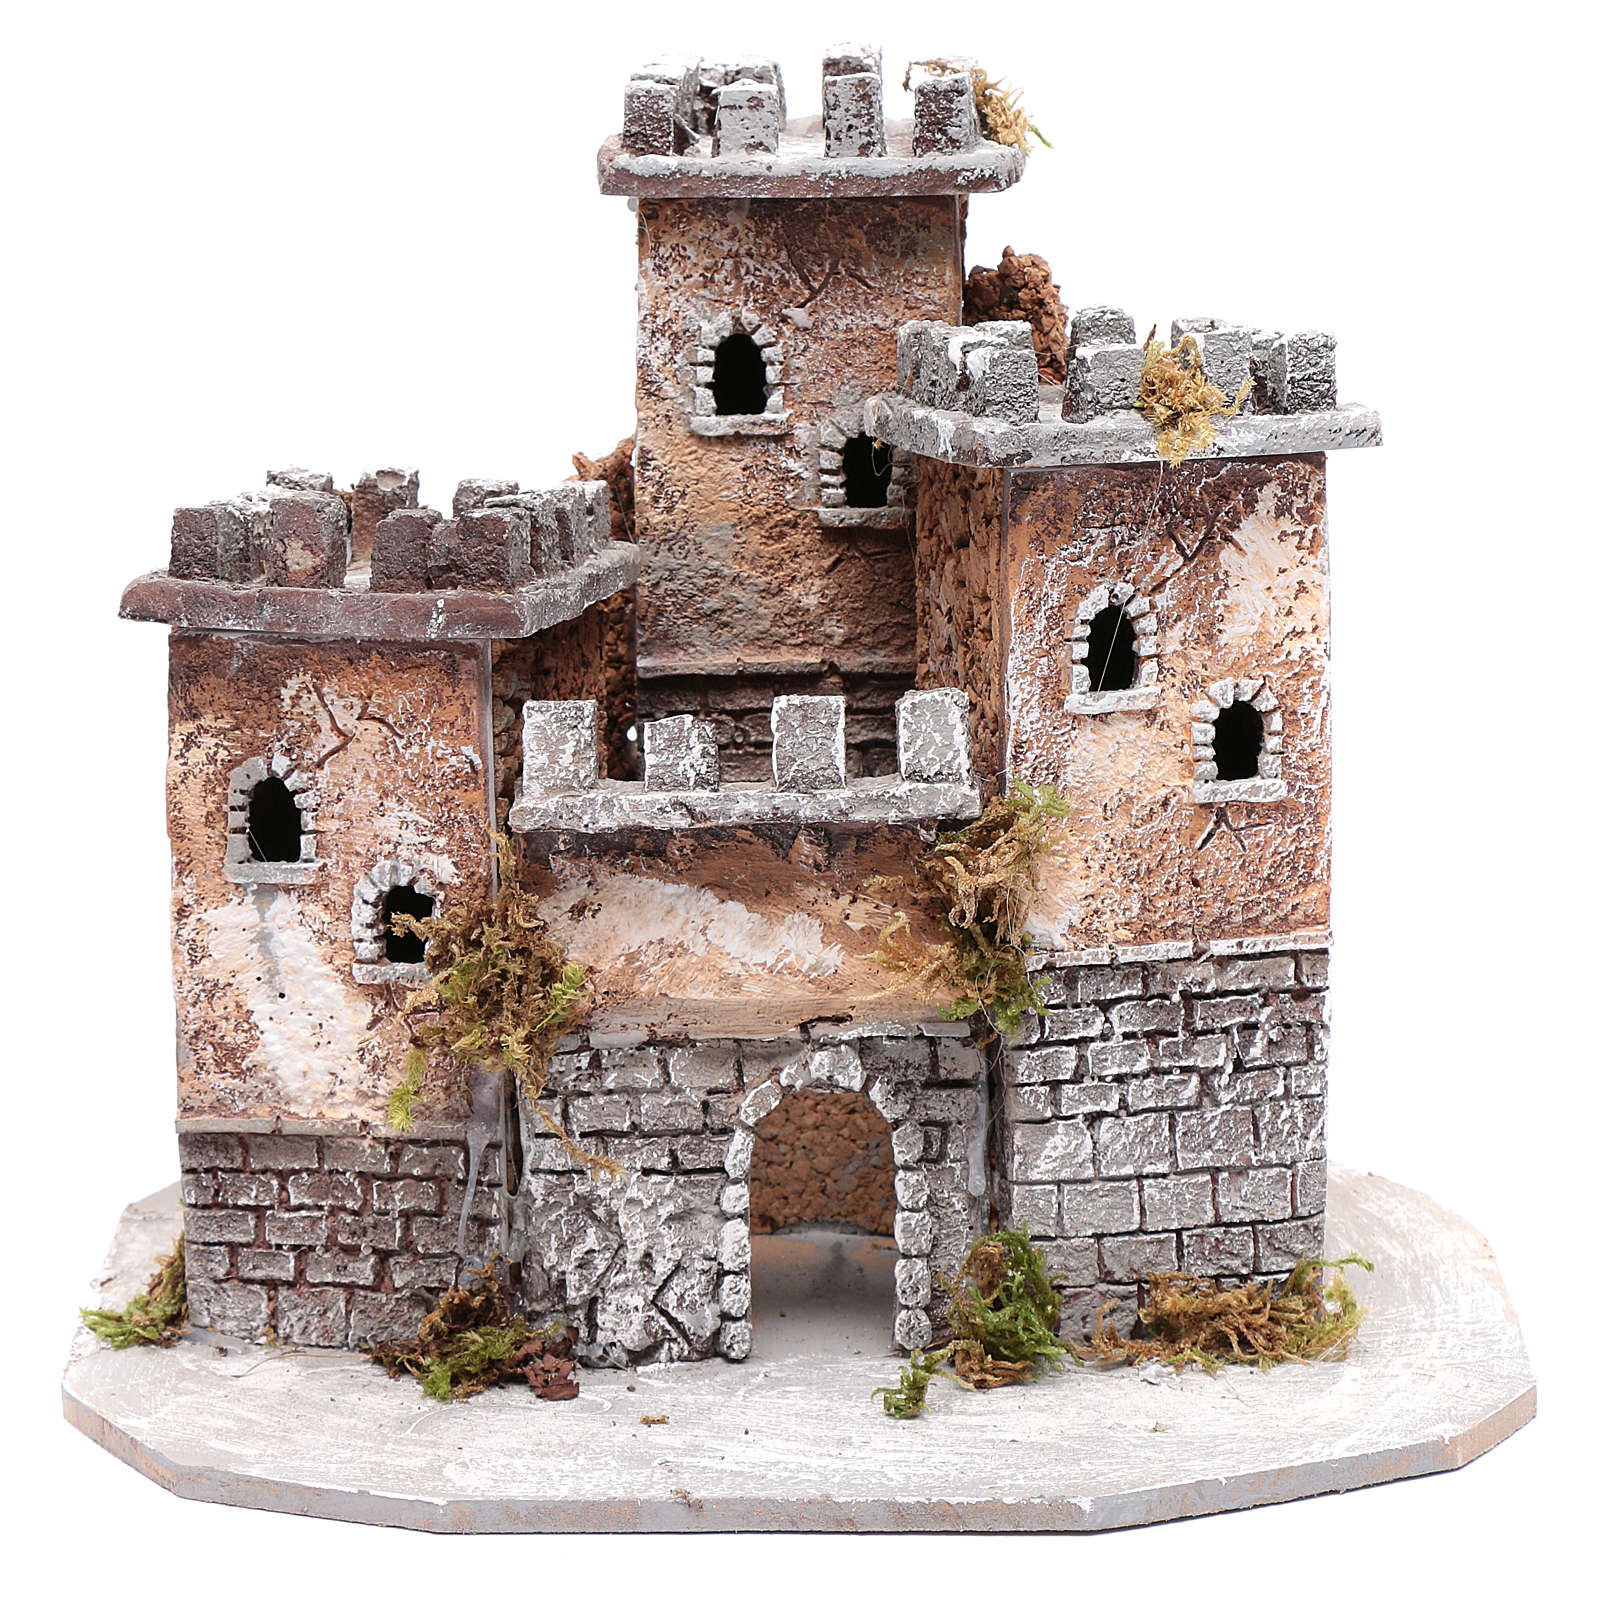 Castle with three towers 30x25x25 cm for Neapolitan nativity scene 4